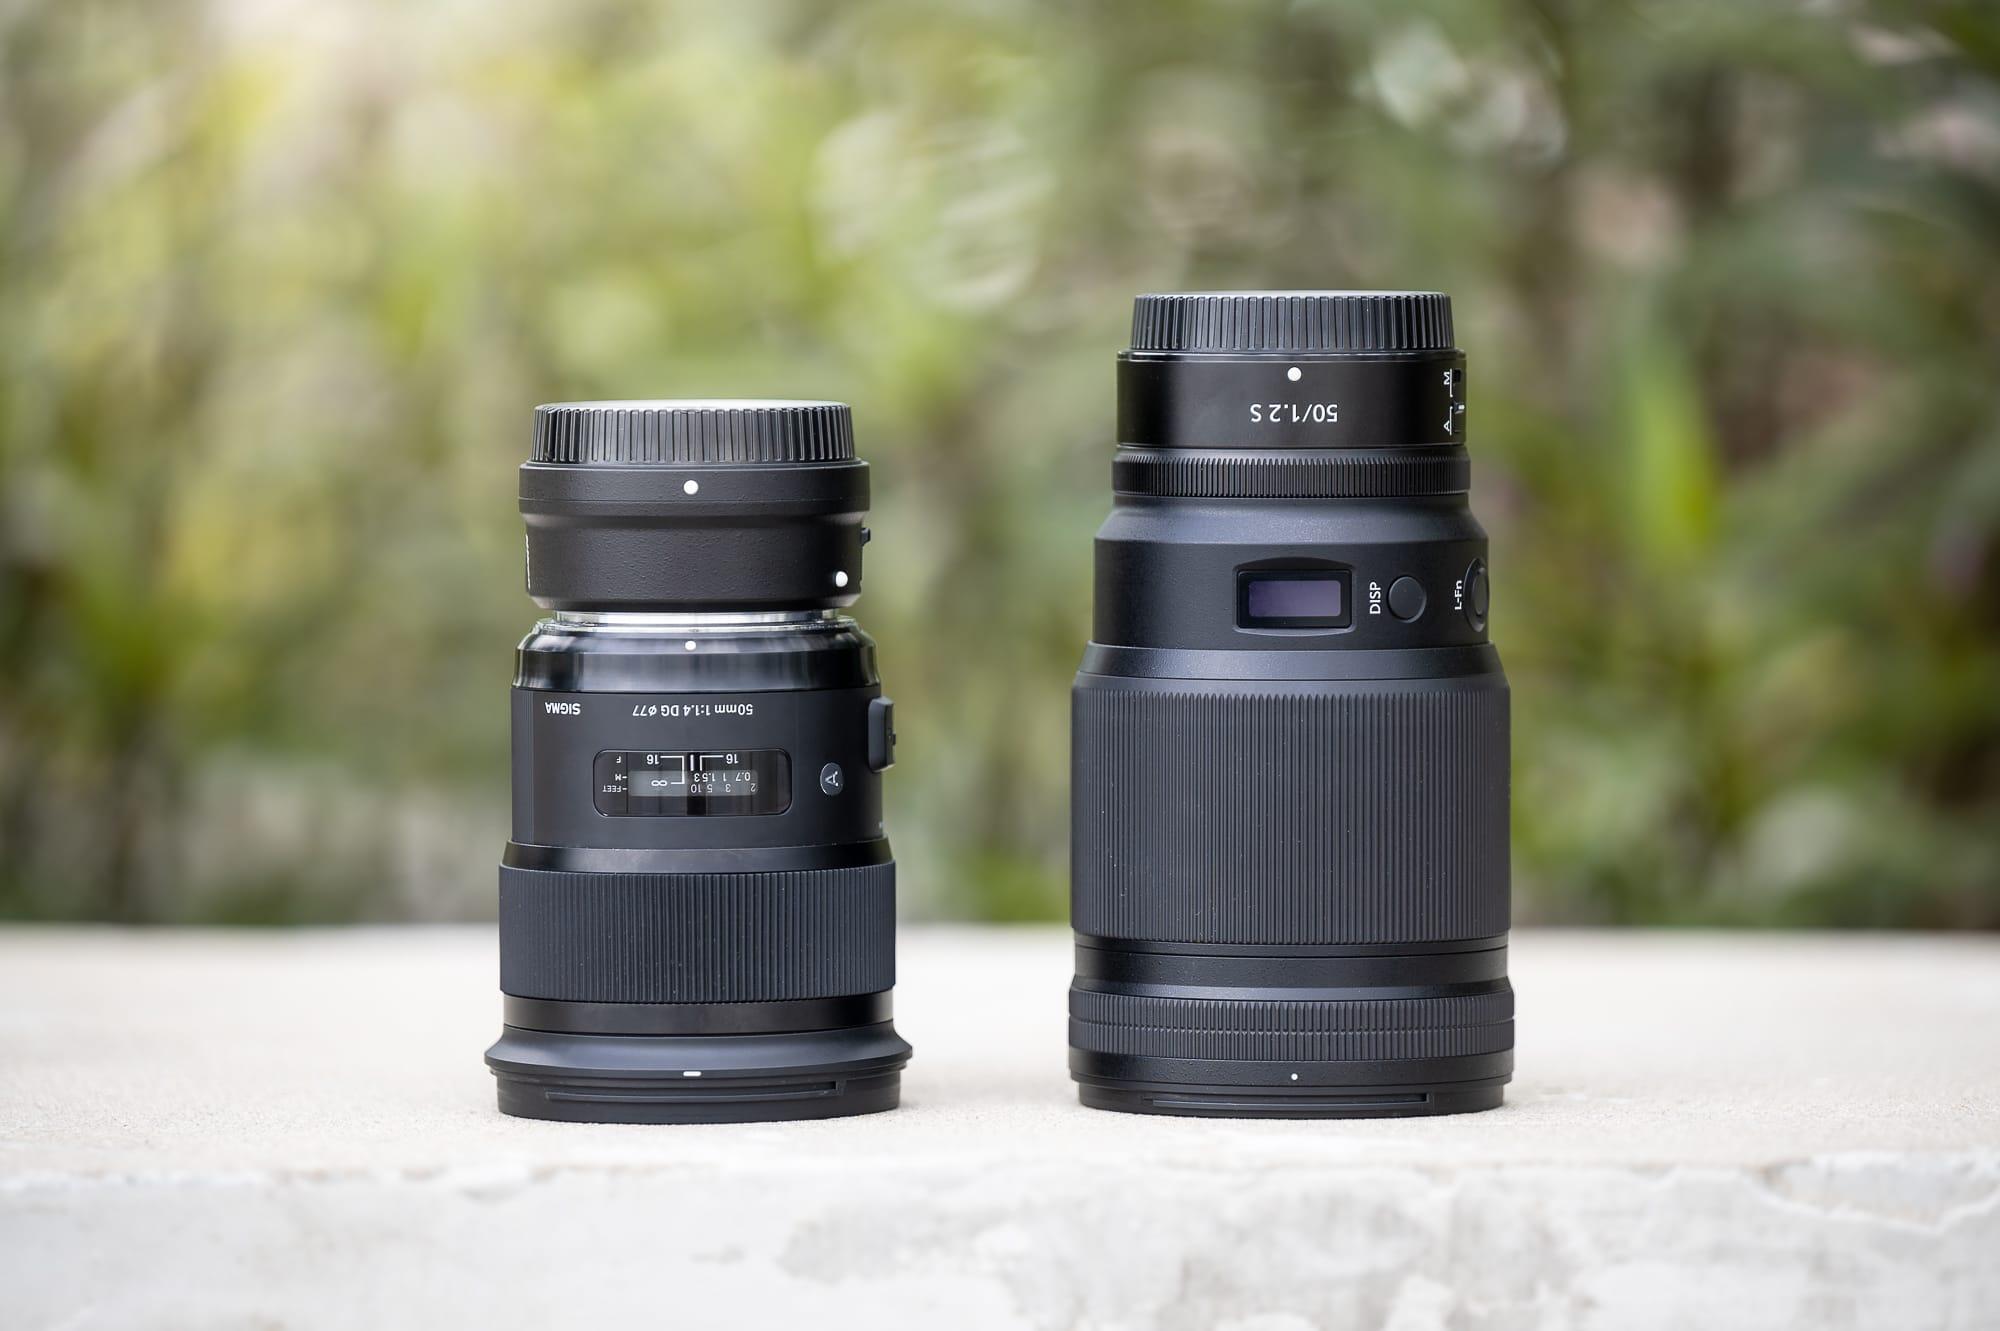 Nikon 50mm F1.2 S review